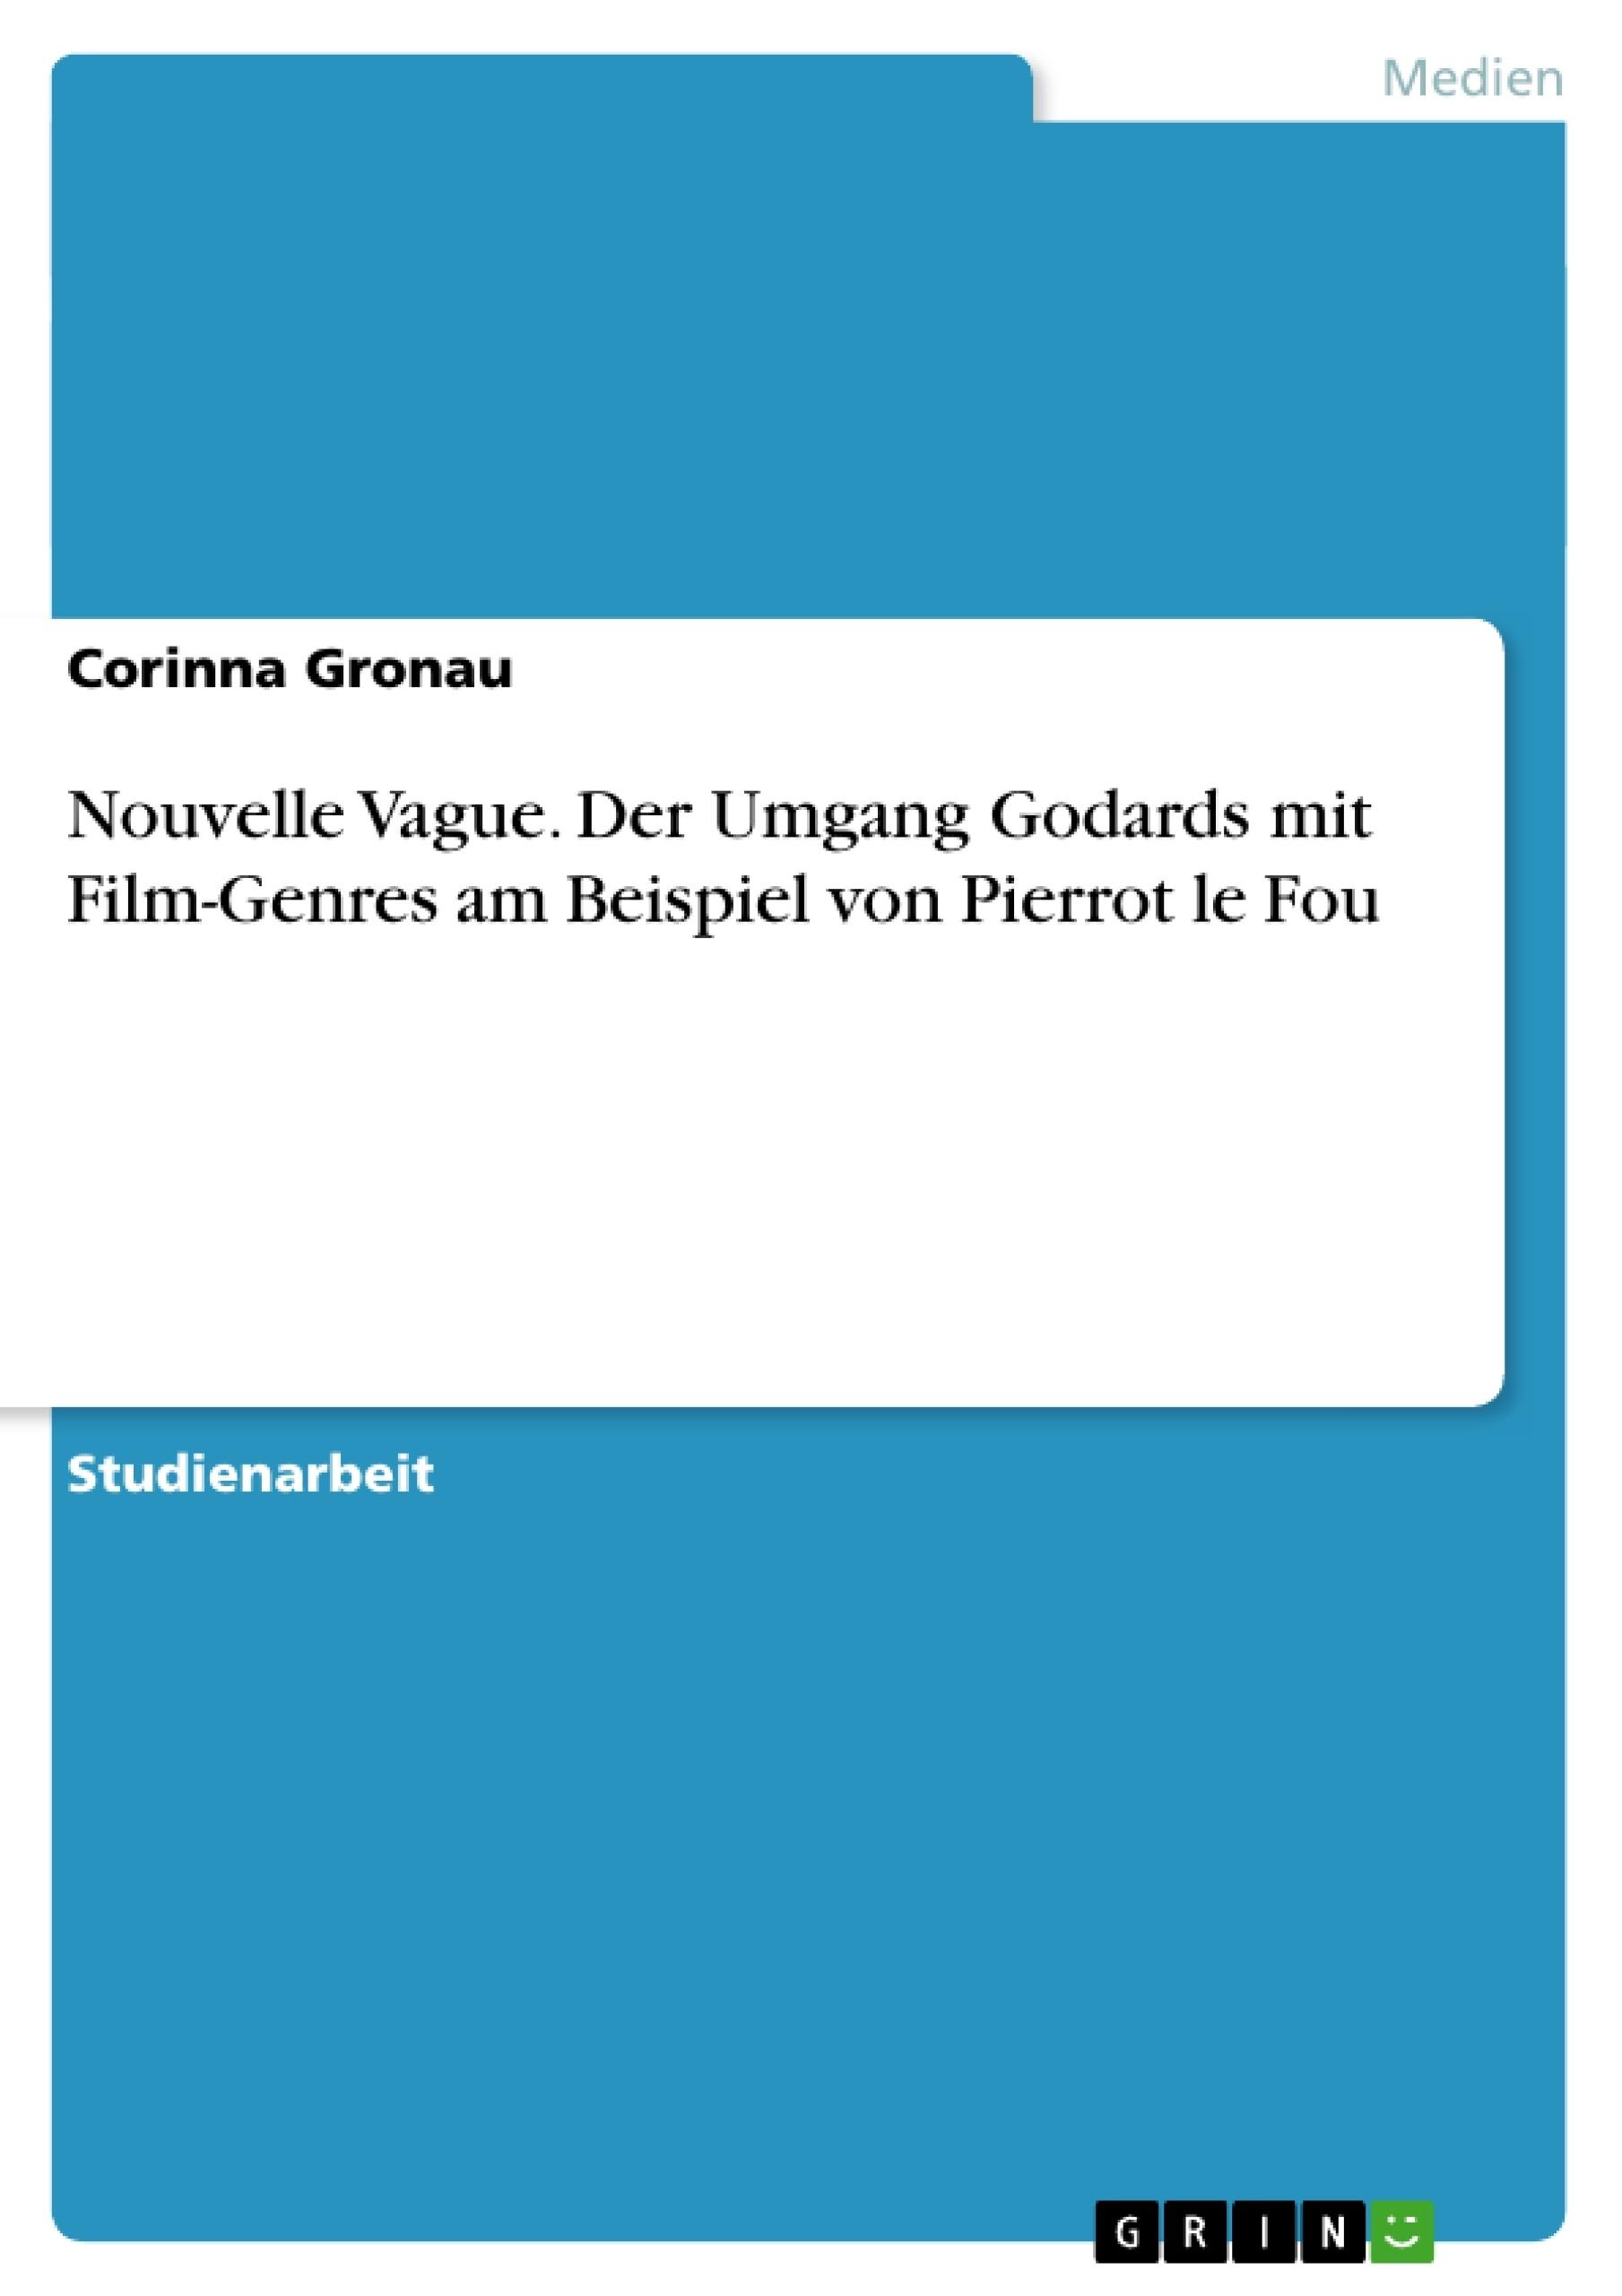 Titel: Nouvelle Vague. Der Umgang Godards mit Film-Genres am Beispiel von Pierrot le Fou